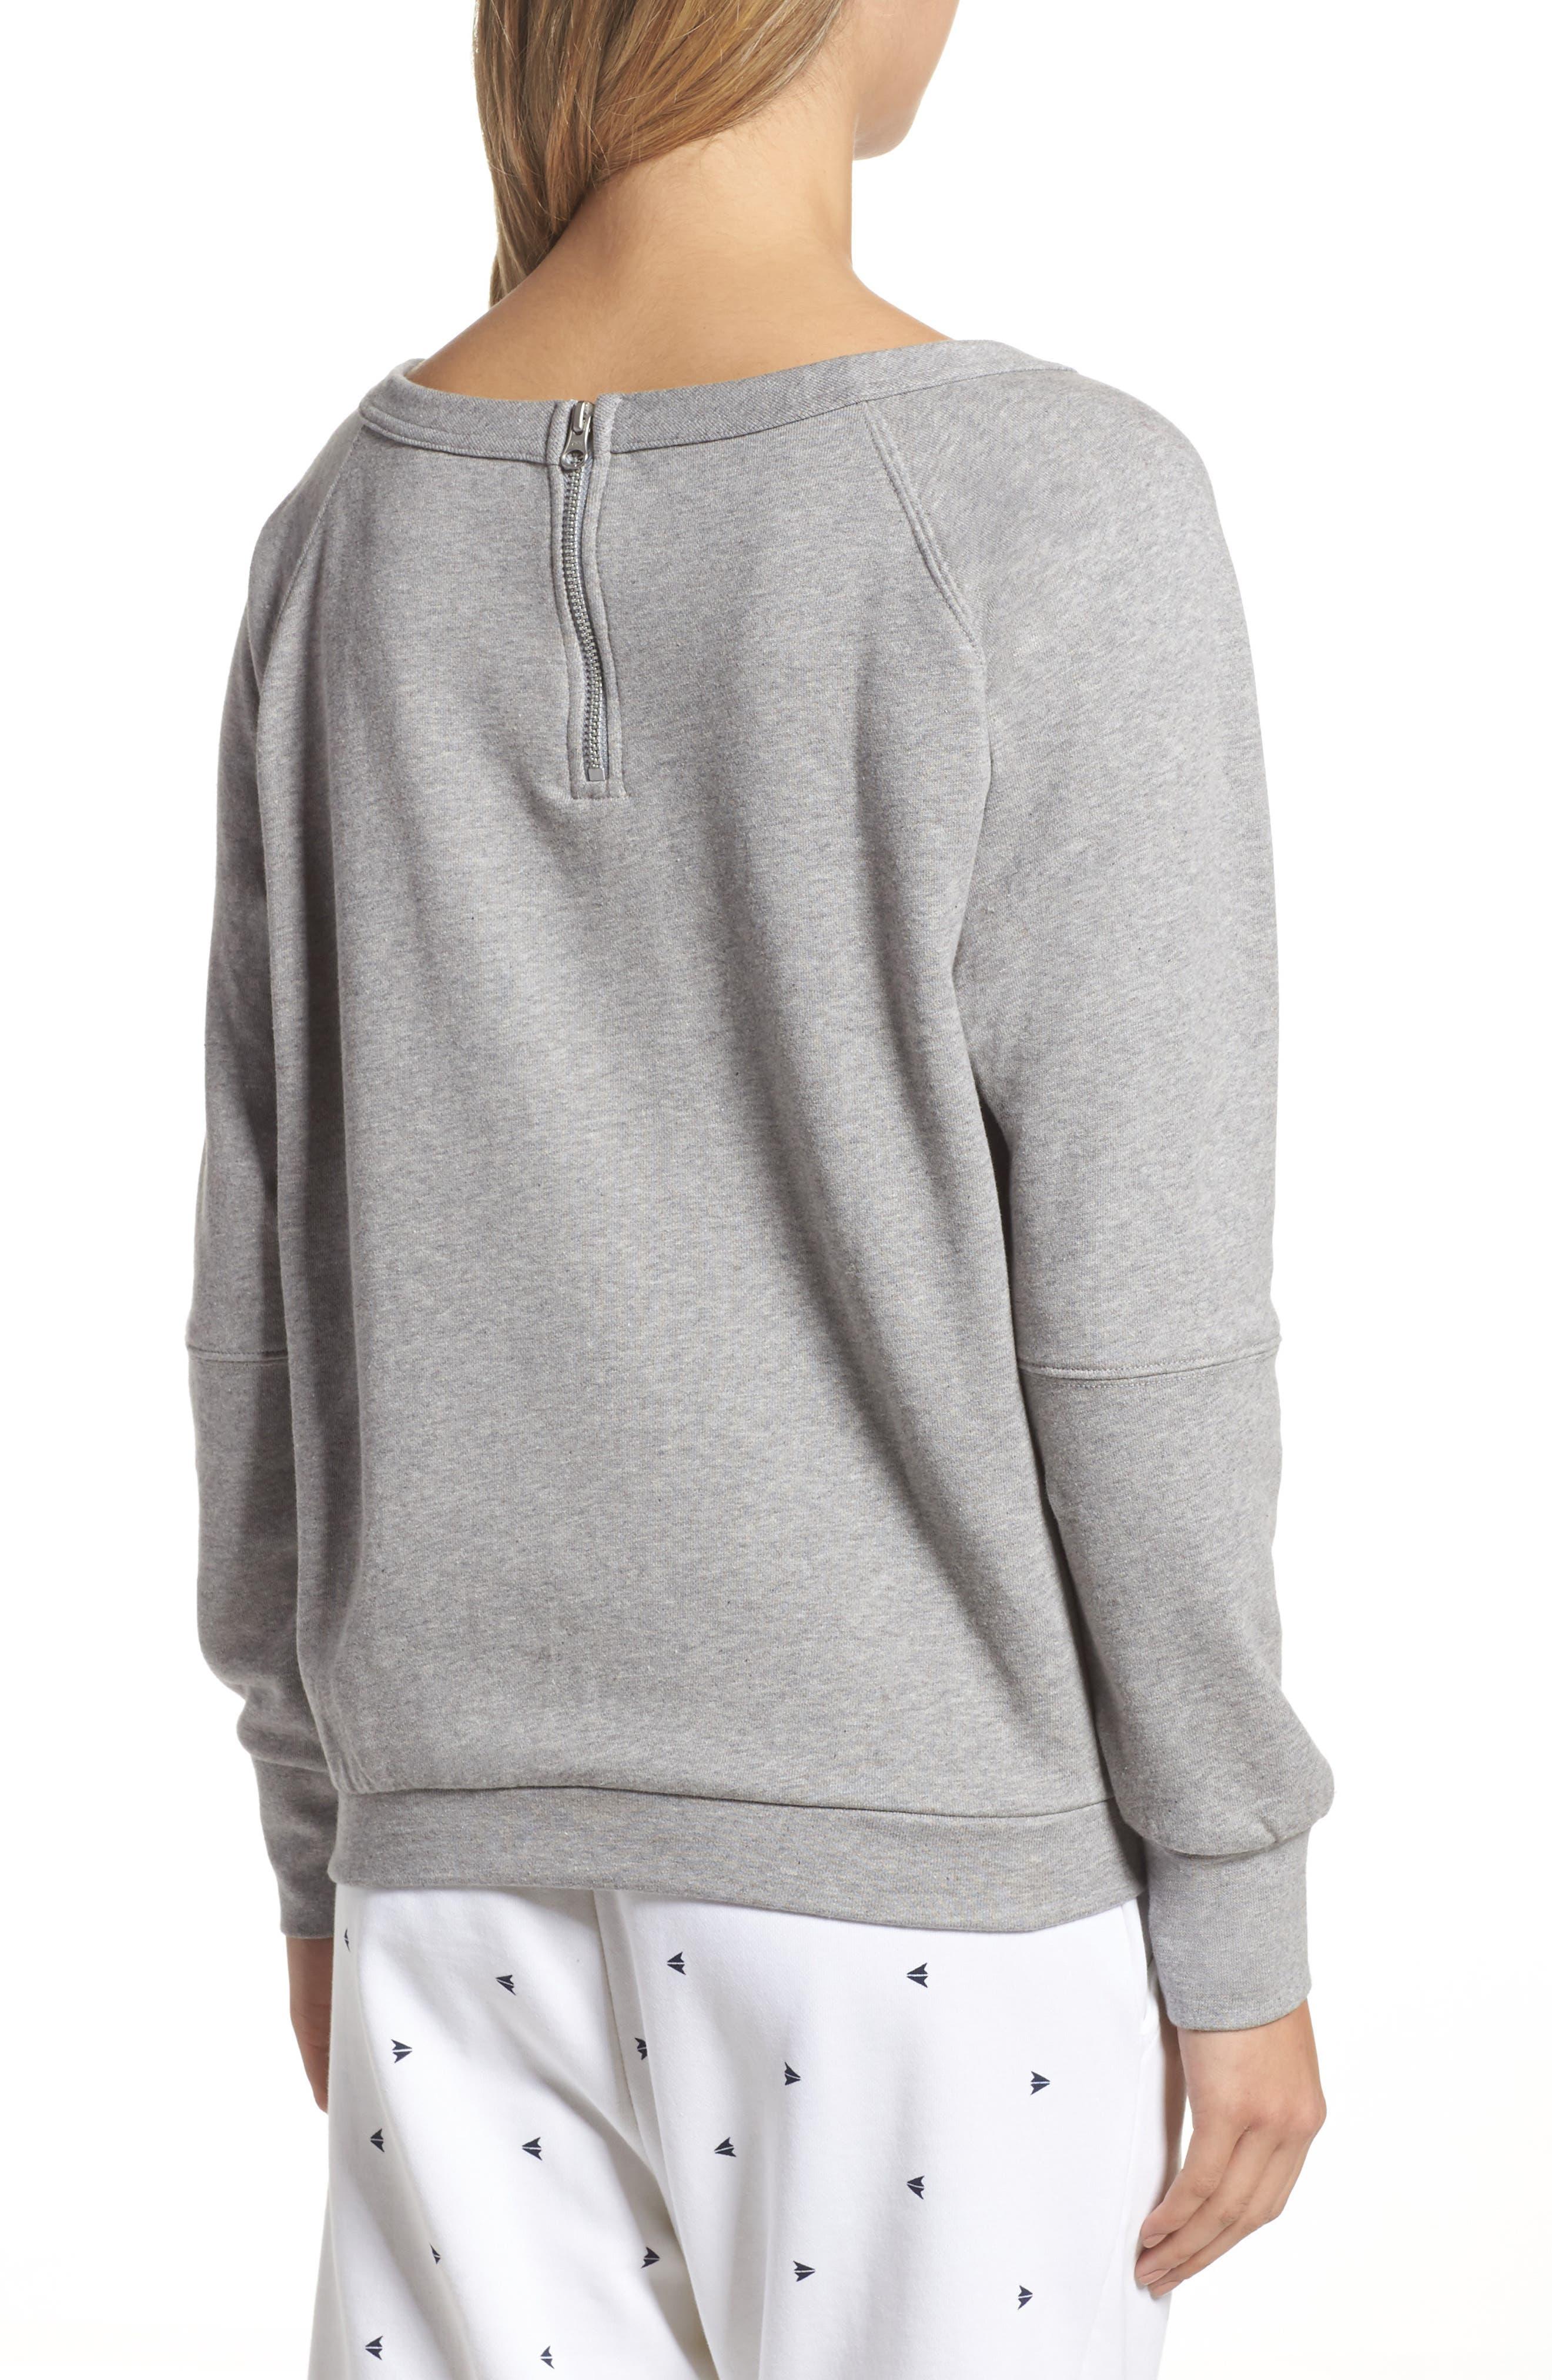 Heritage Starcrest Sweatshirt,                             Alternate thumbnail 2, color,                             Medium Heather Grey